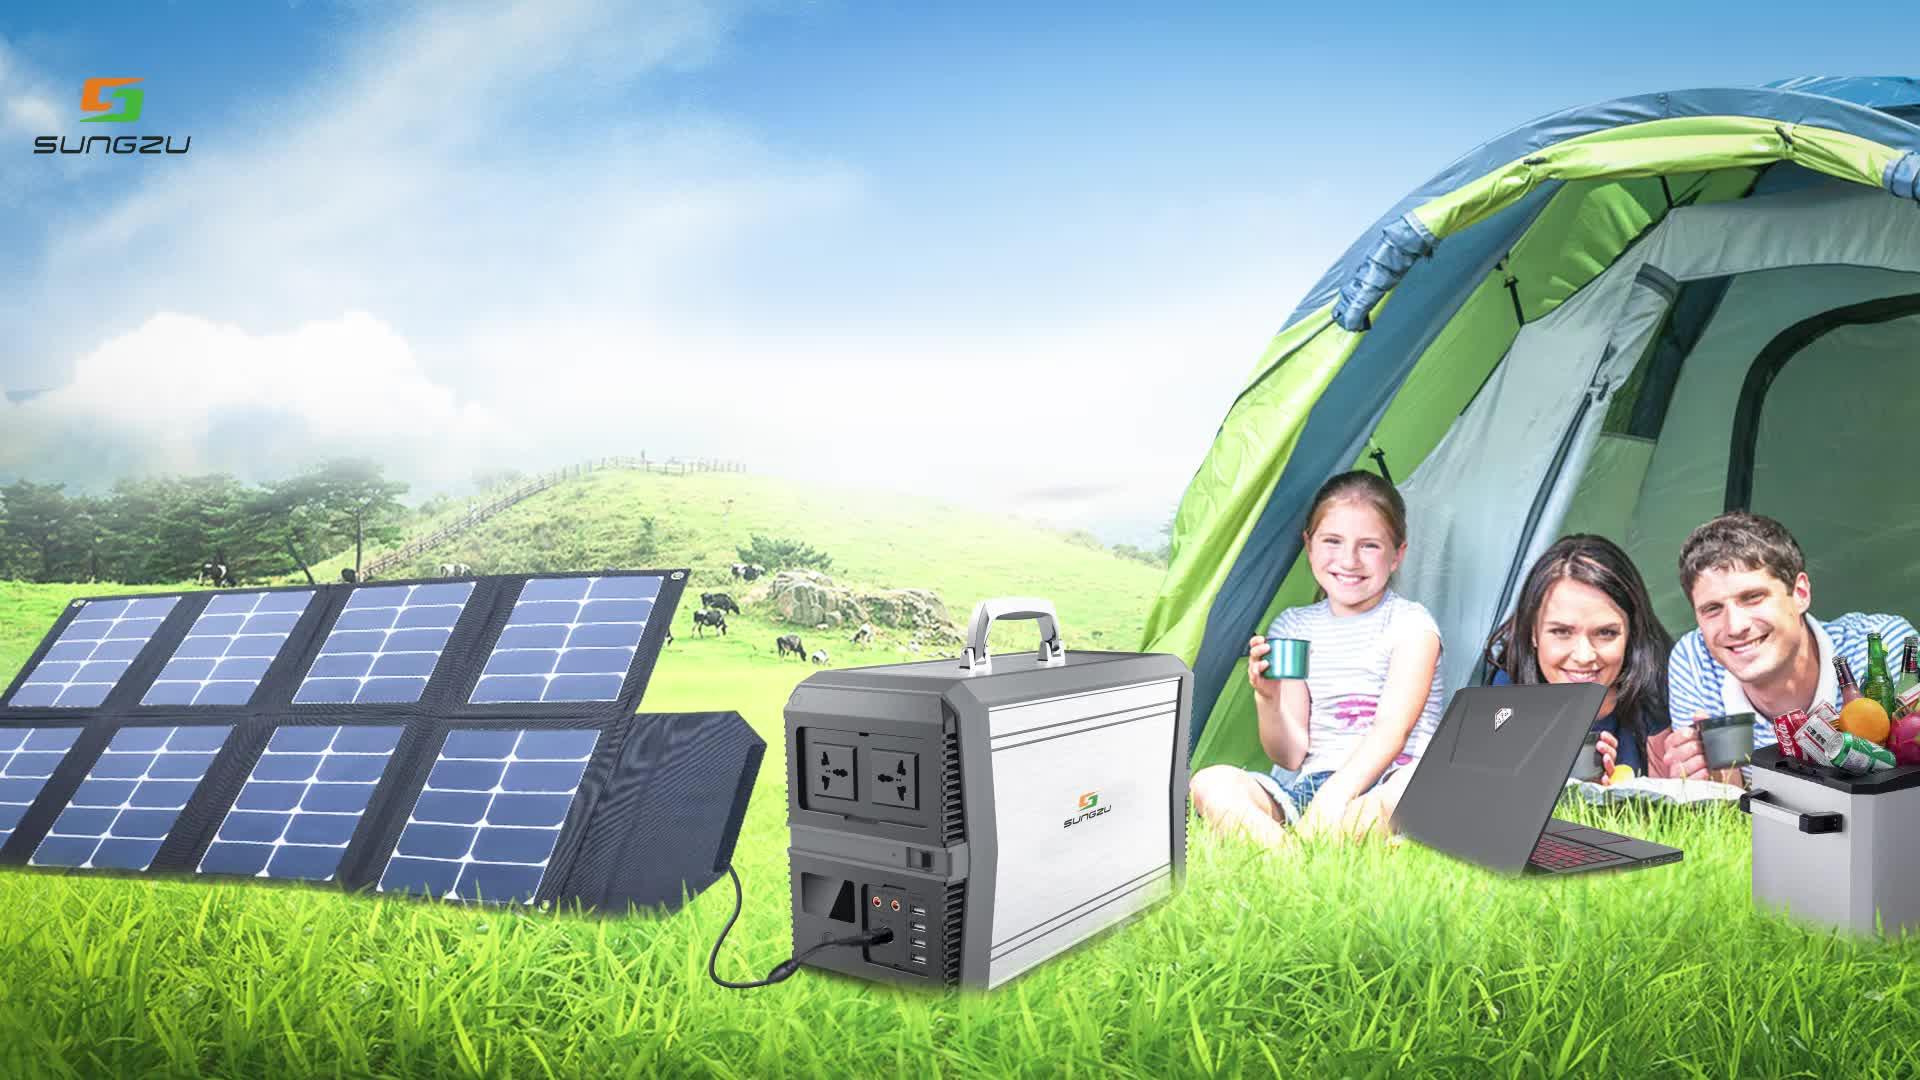 Sungzu पोर्टेबल सौर जनरेटर 1KW बंद ग्रिड घर सौर ऊर्जा प्रणाली Batterie पावर बैंक स्टेशन 220v